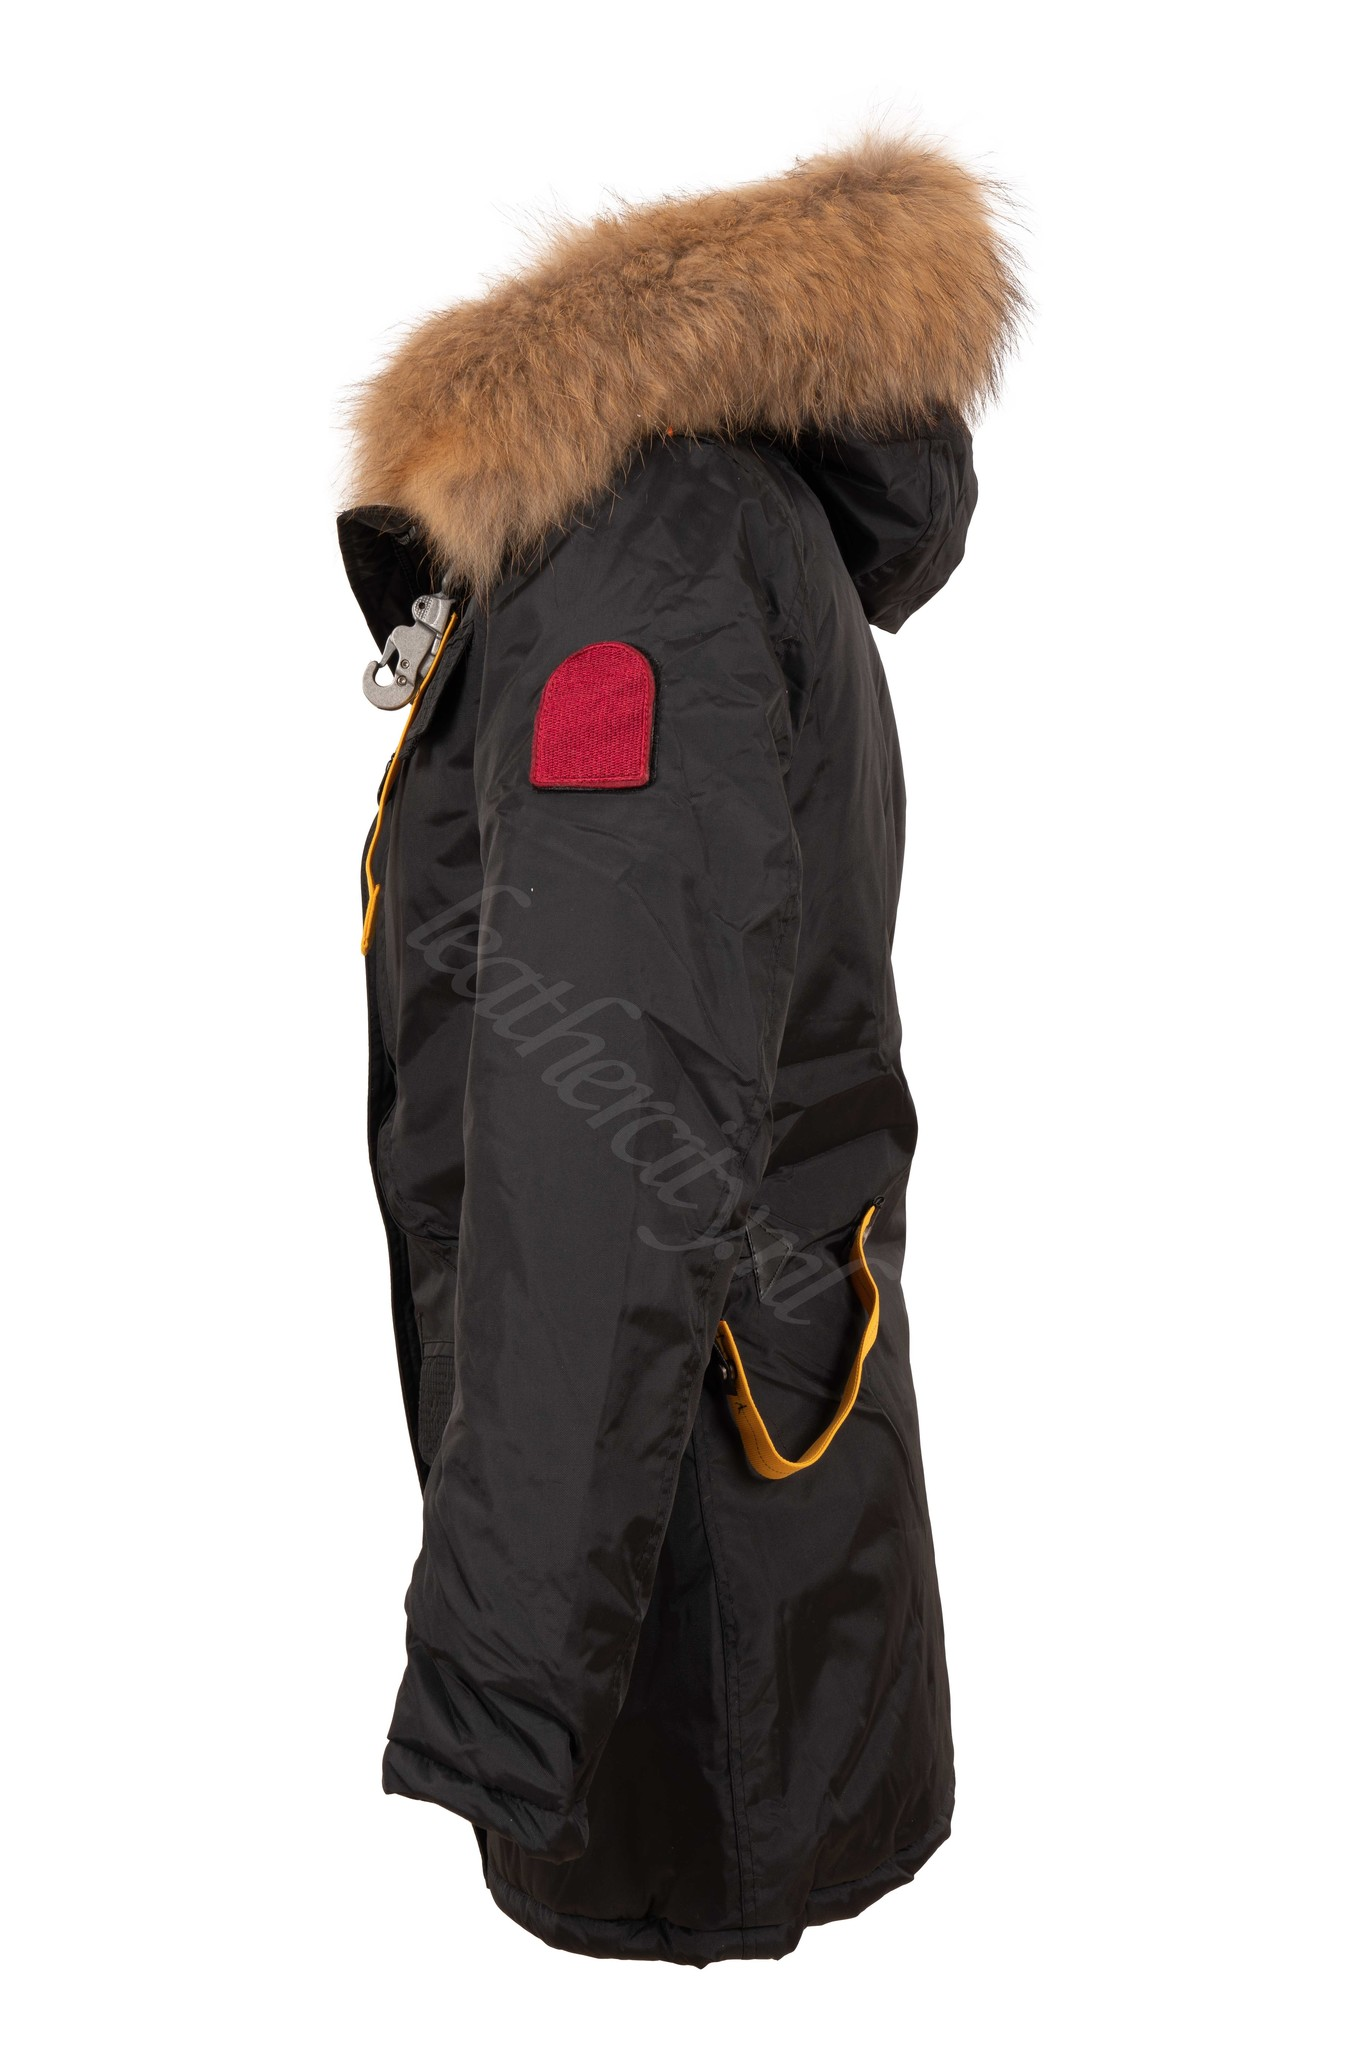 Dames winterjas met bont zwart PJ half lang